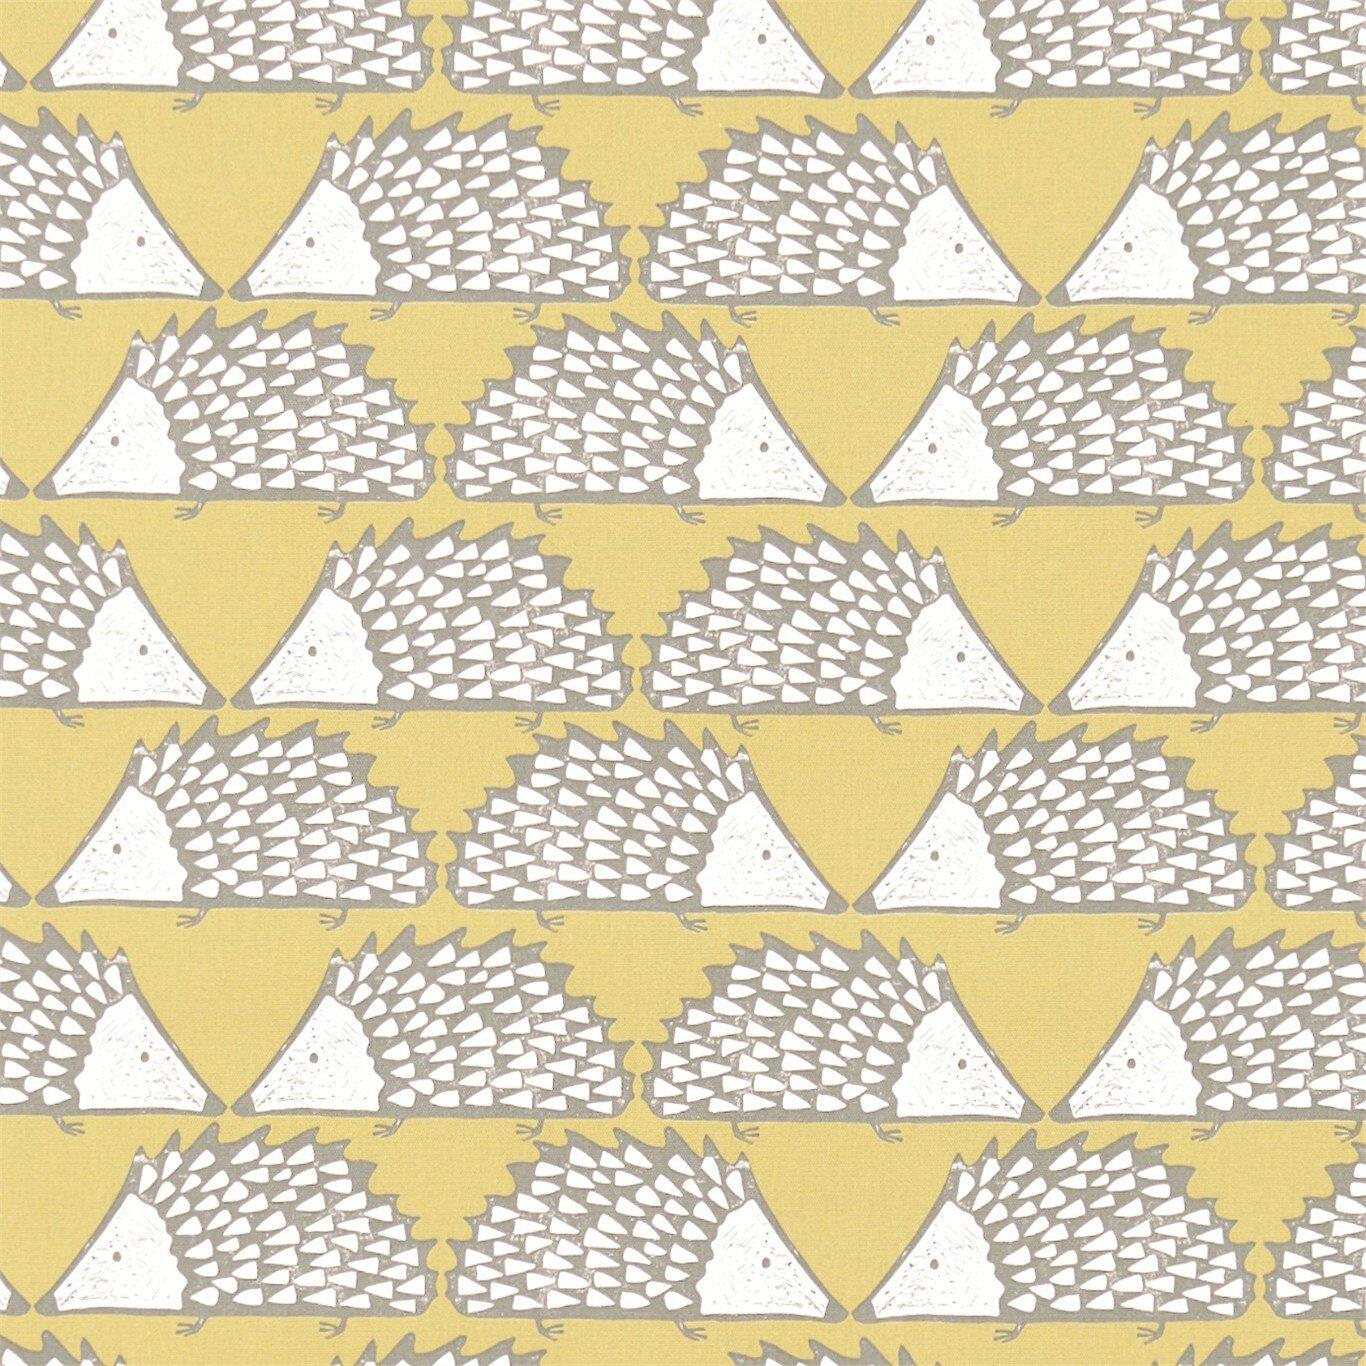 Papier Peint Design Scandinave Frdesigner Co